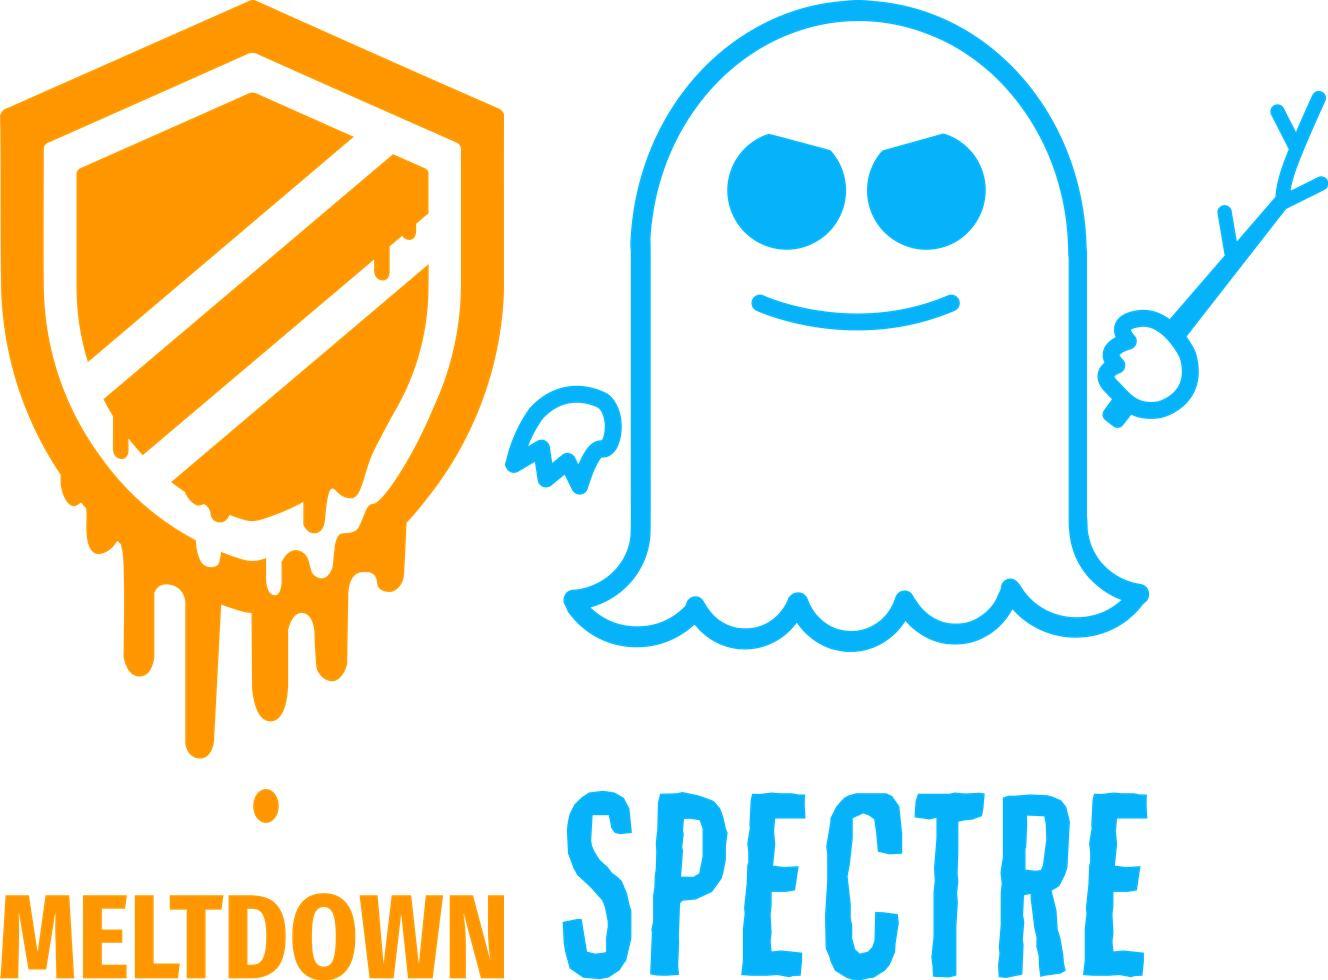 Meltdown Spectre